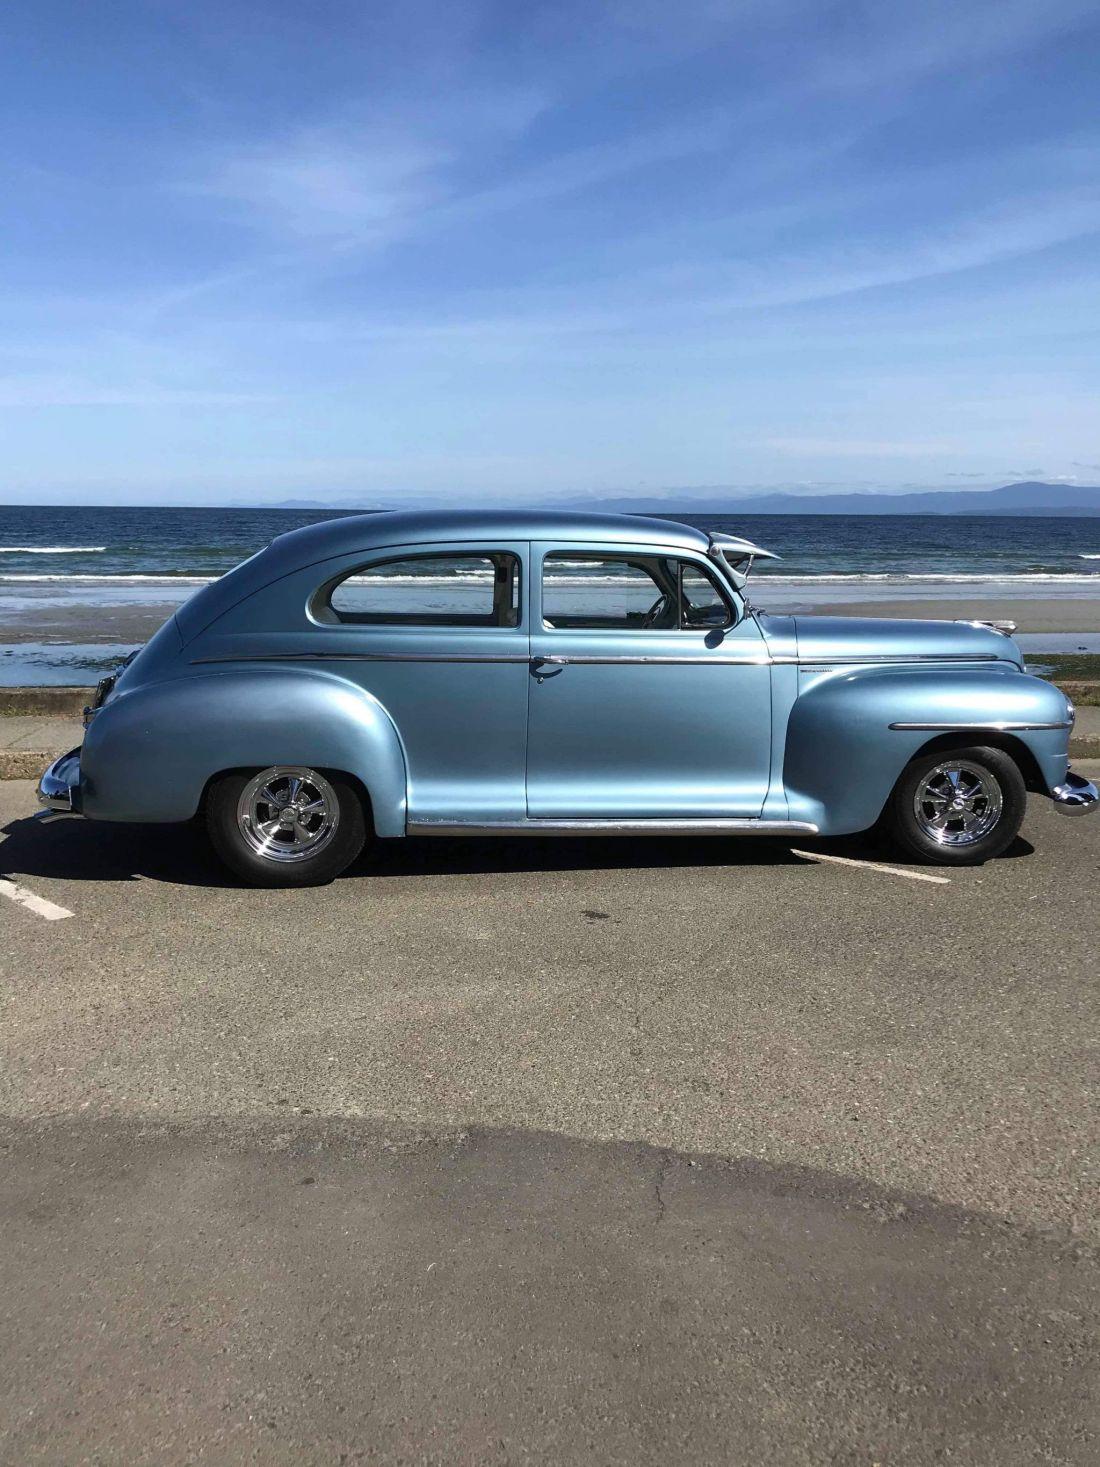 Vintage car at Qualicum Beach, Vancouver Island